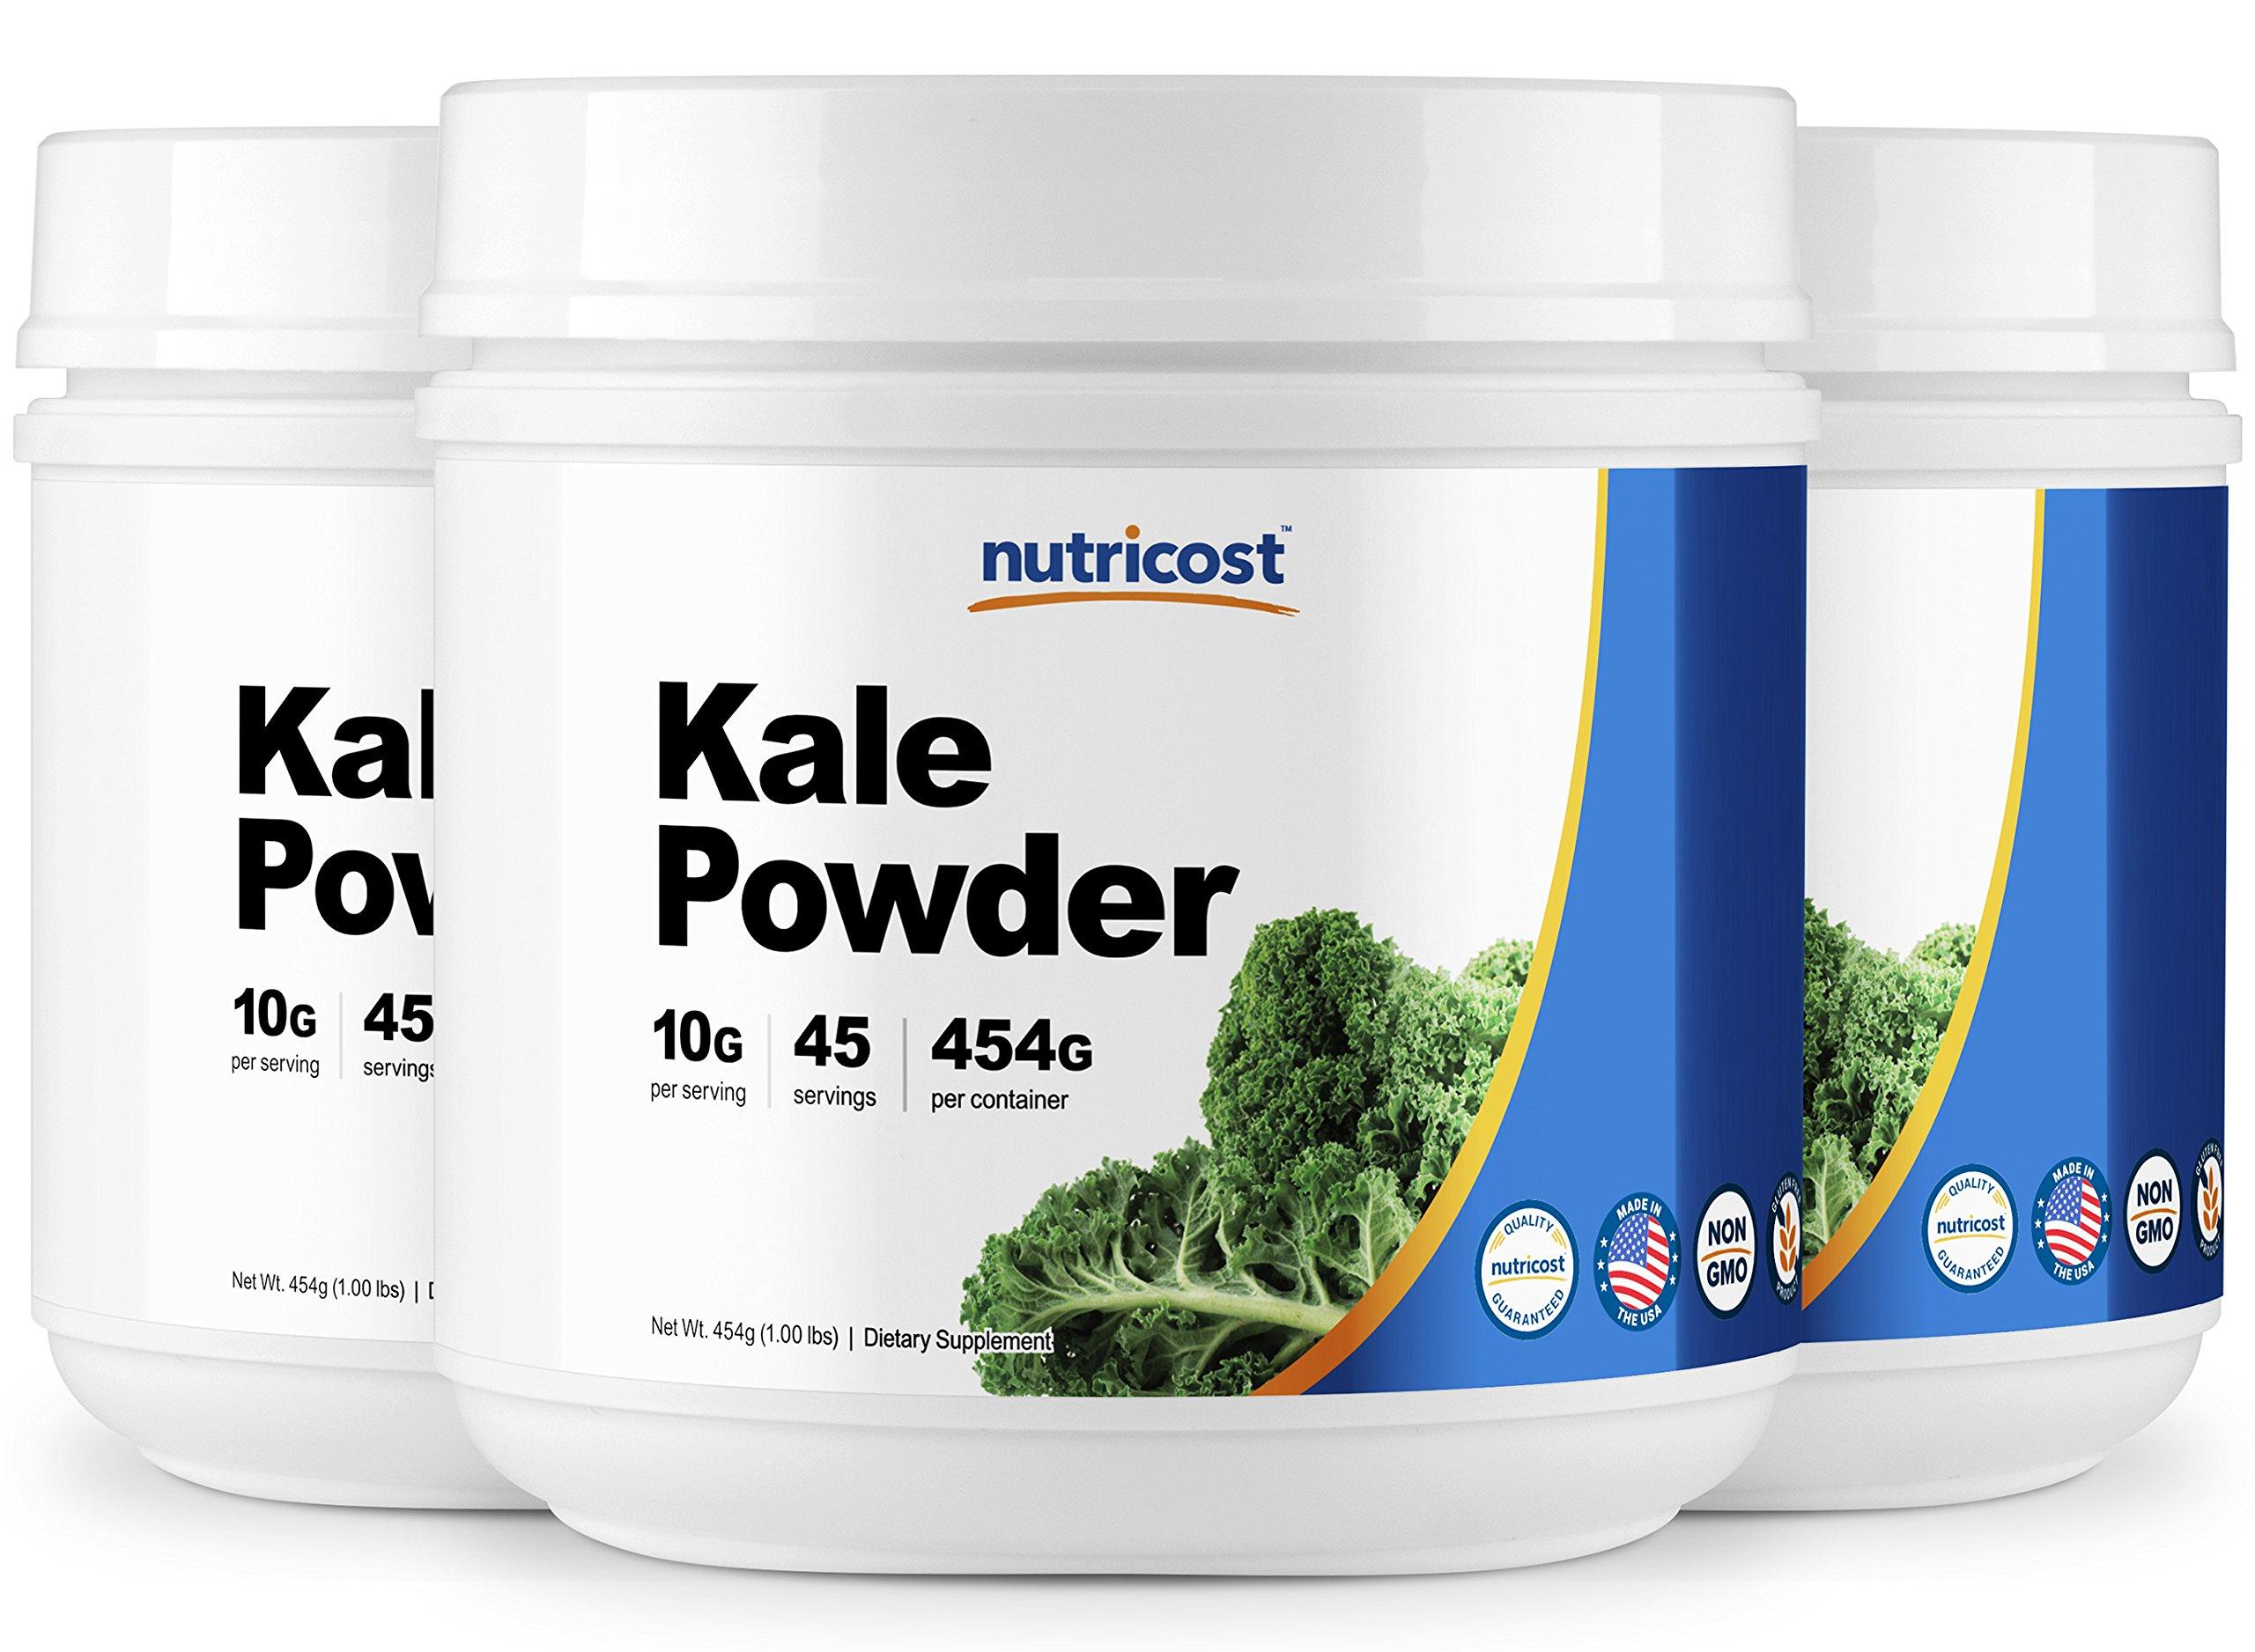 Nutricost Kale Powder 1LB (3 Bottles) - All Natural, Non-GMO, Gluten Free, Pure, Premium Kale